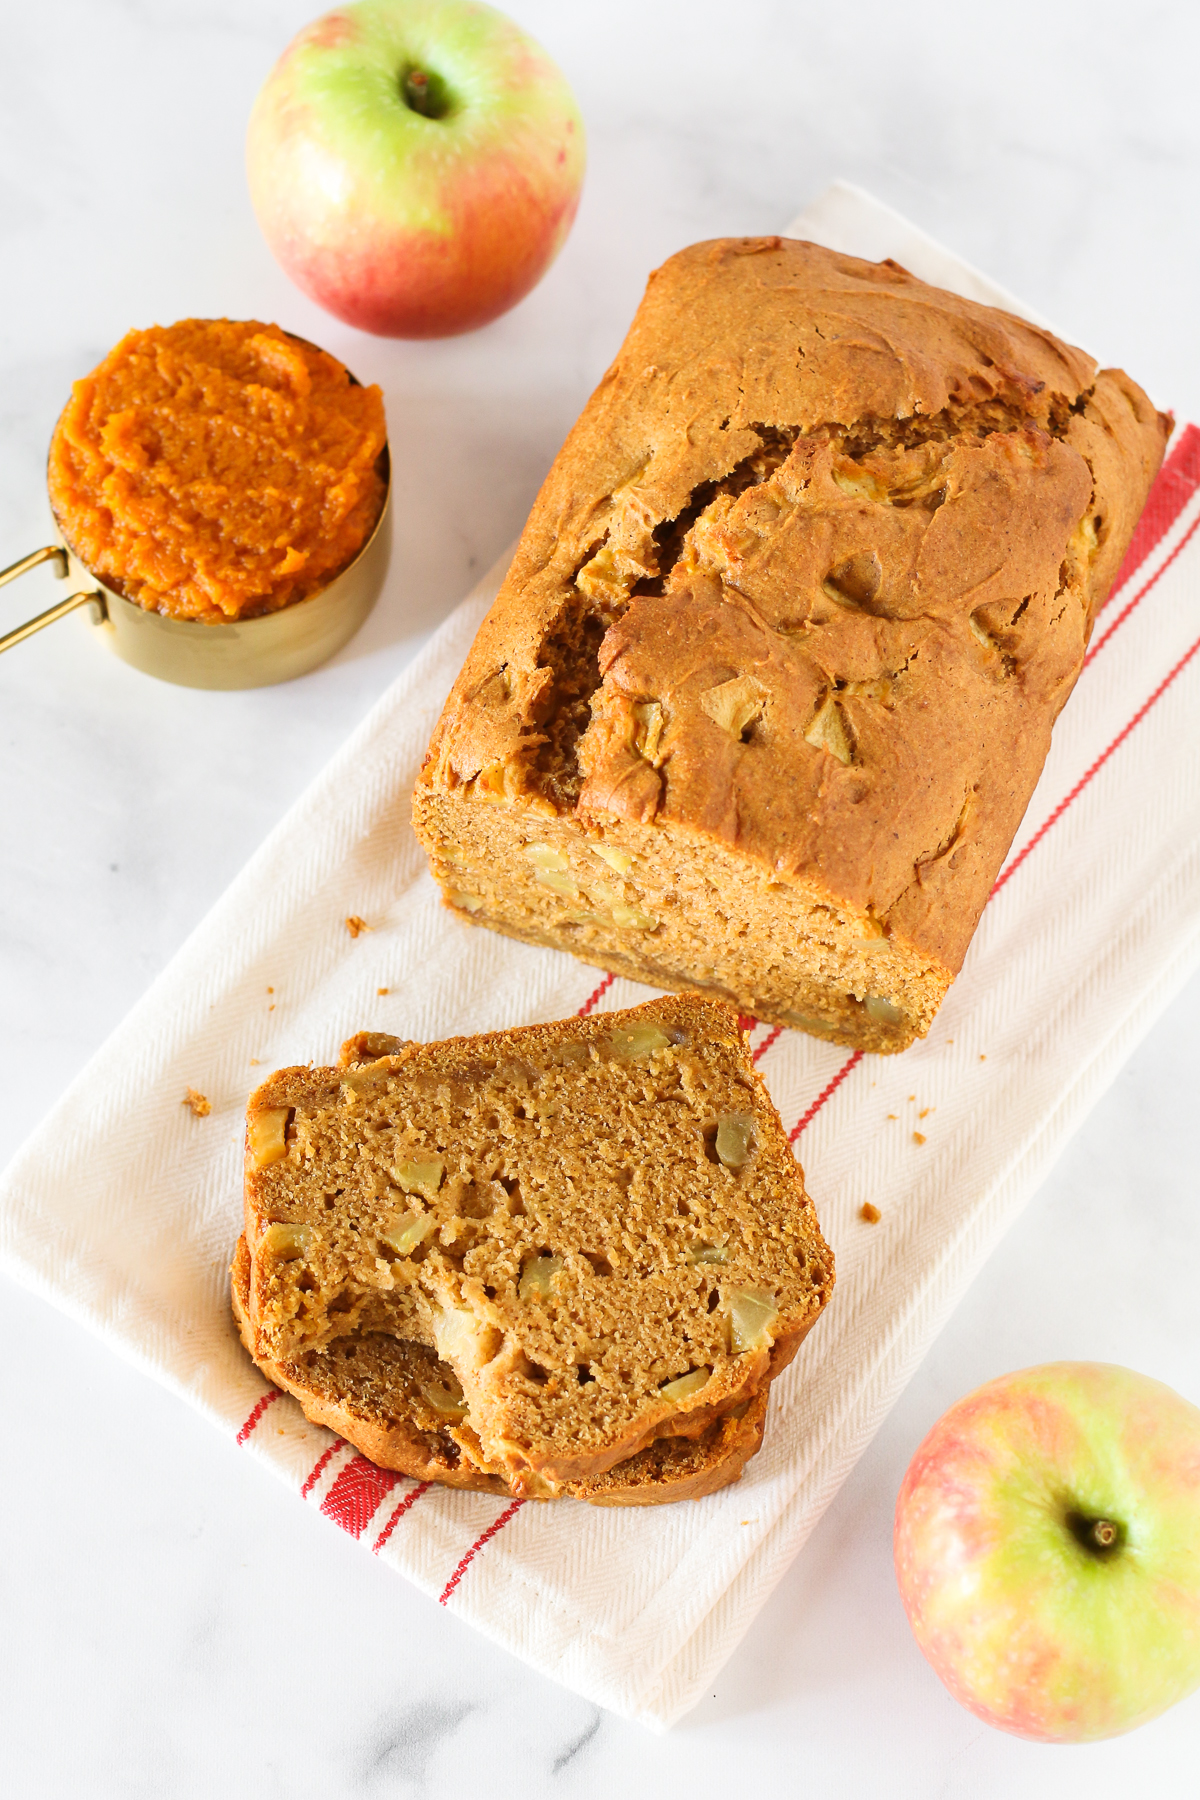 Gluten Free Vegan Pumpkin Apple Bread. Moist pumpkin bread, perfectly spiced and loaded with fresh apples.